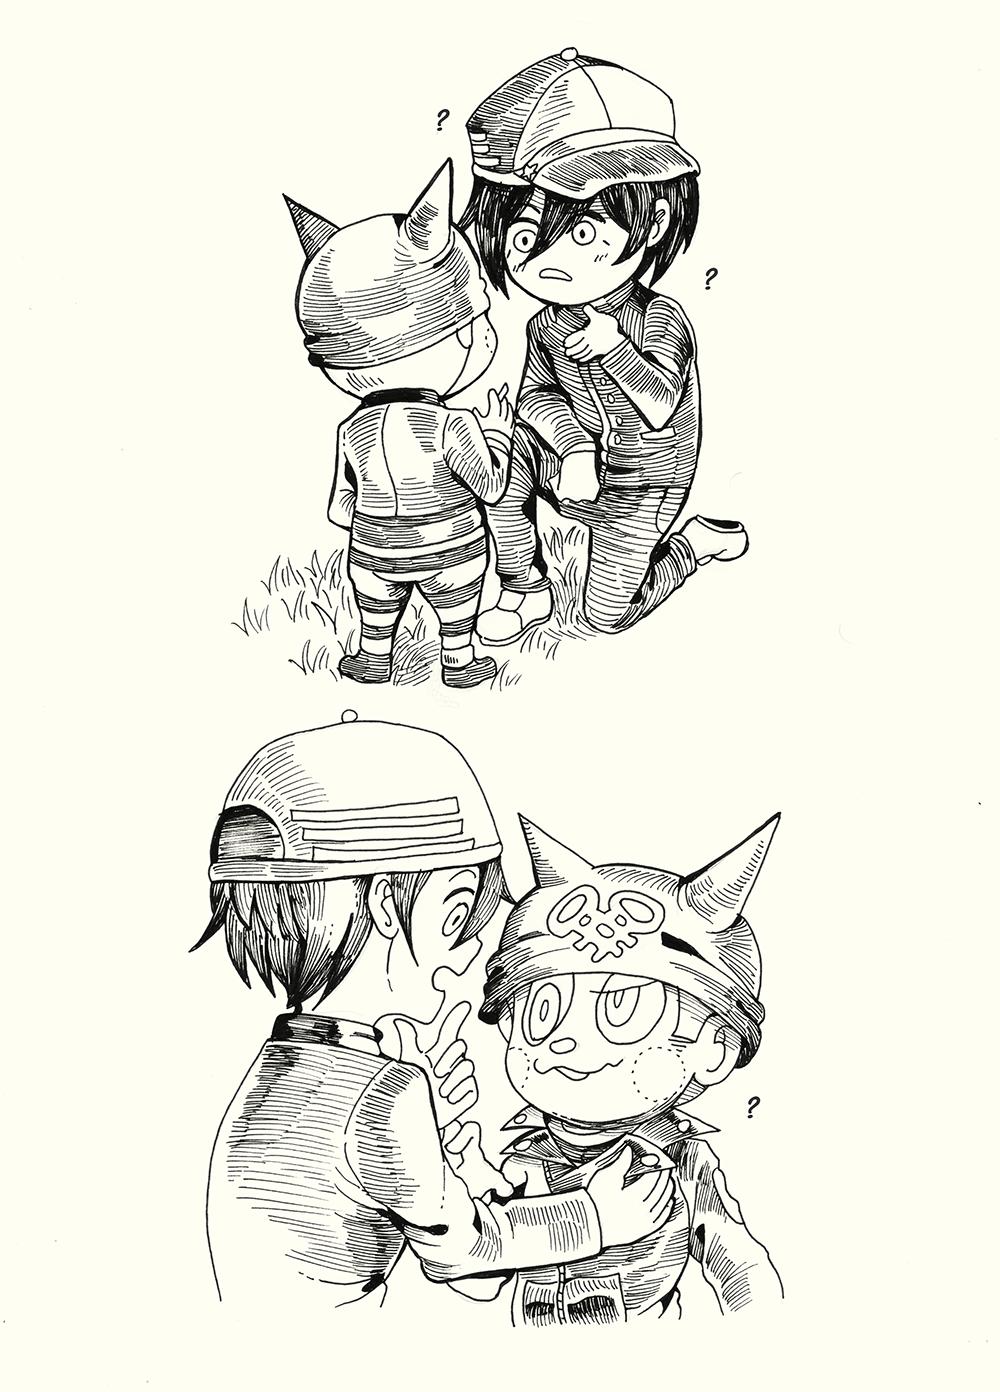 Shuichi Notices The Buttons On Ryoma S Jacket Danganronpa Characters Danganronpa Anime Ryouma hoshi is a character. shuichi notices the buttons on ryoma s